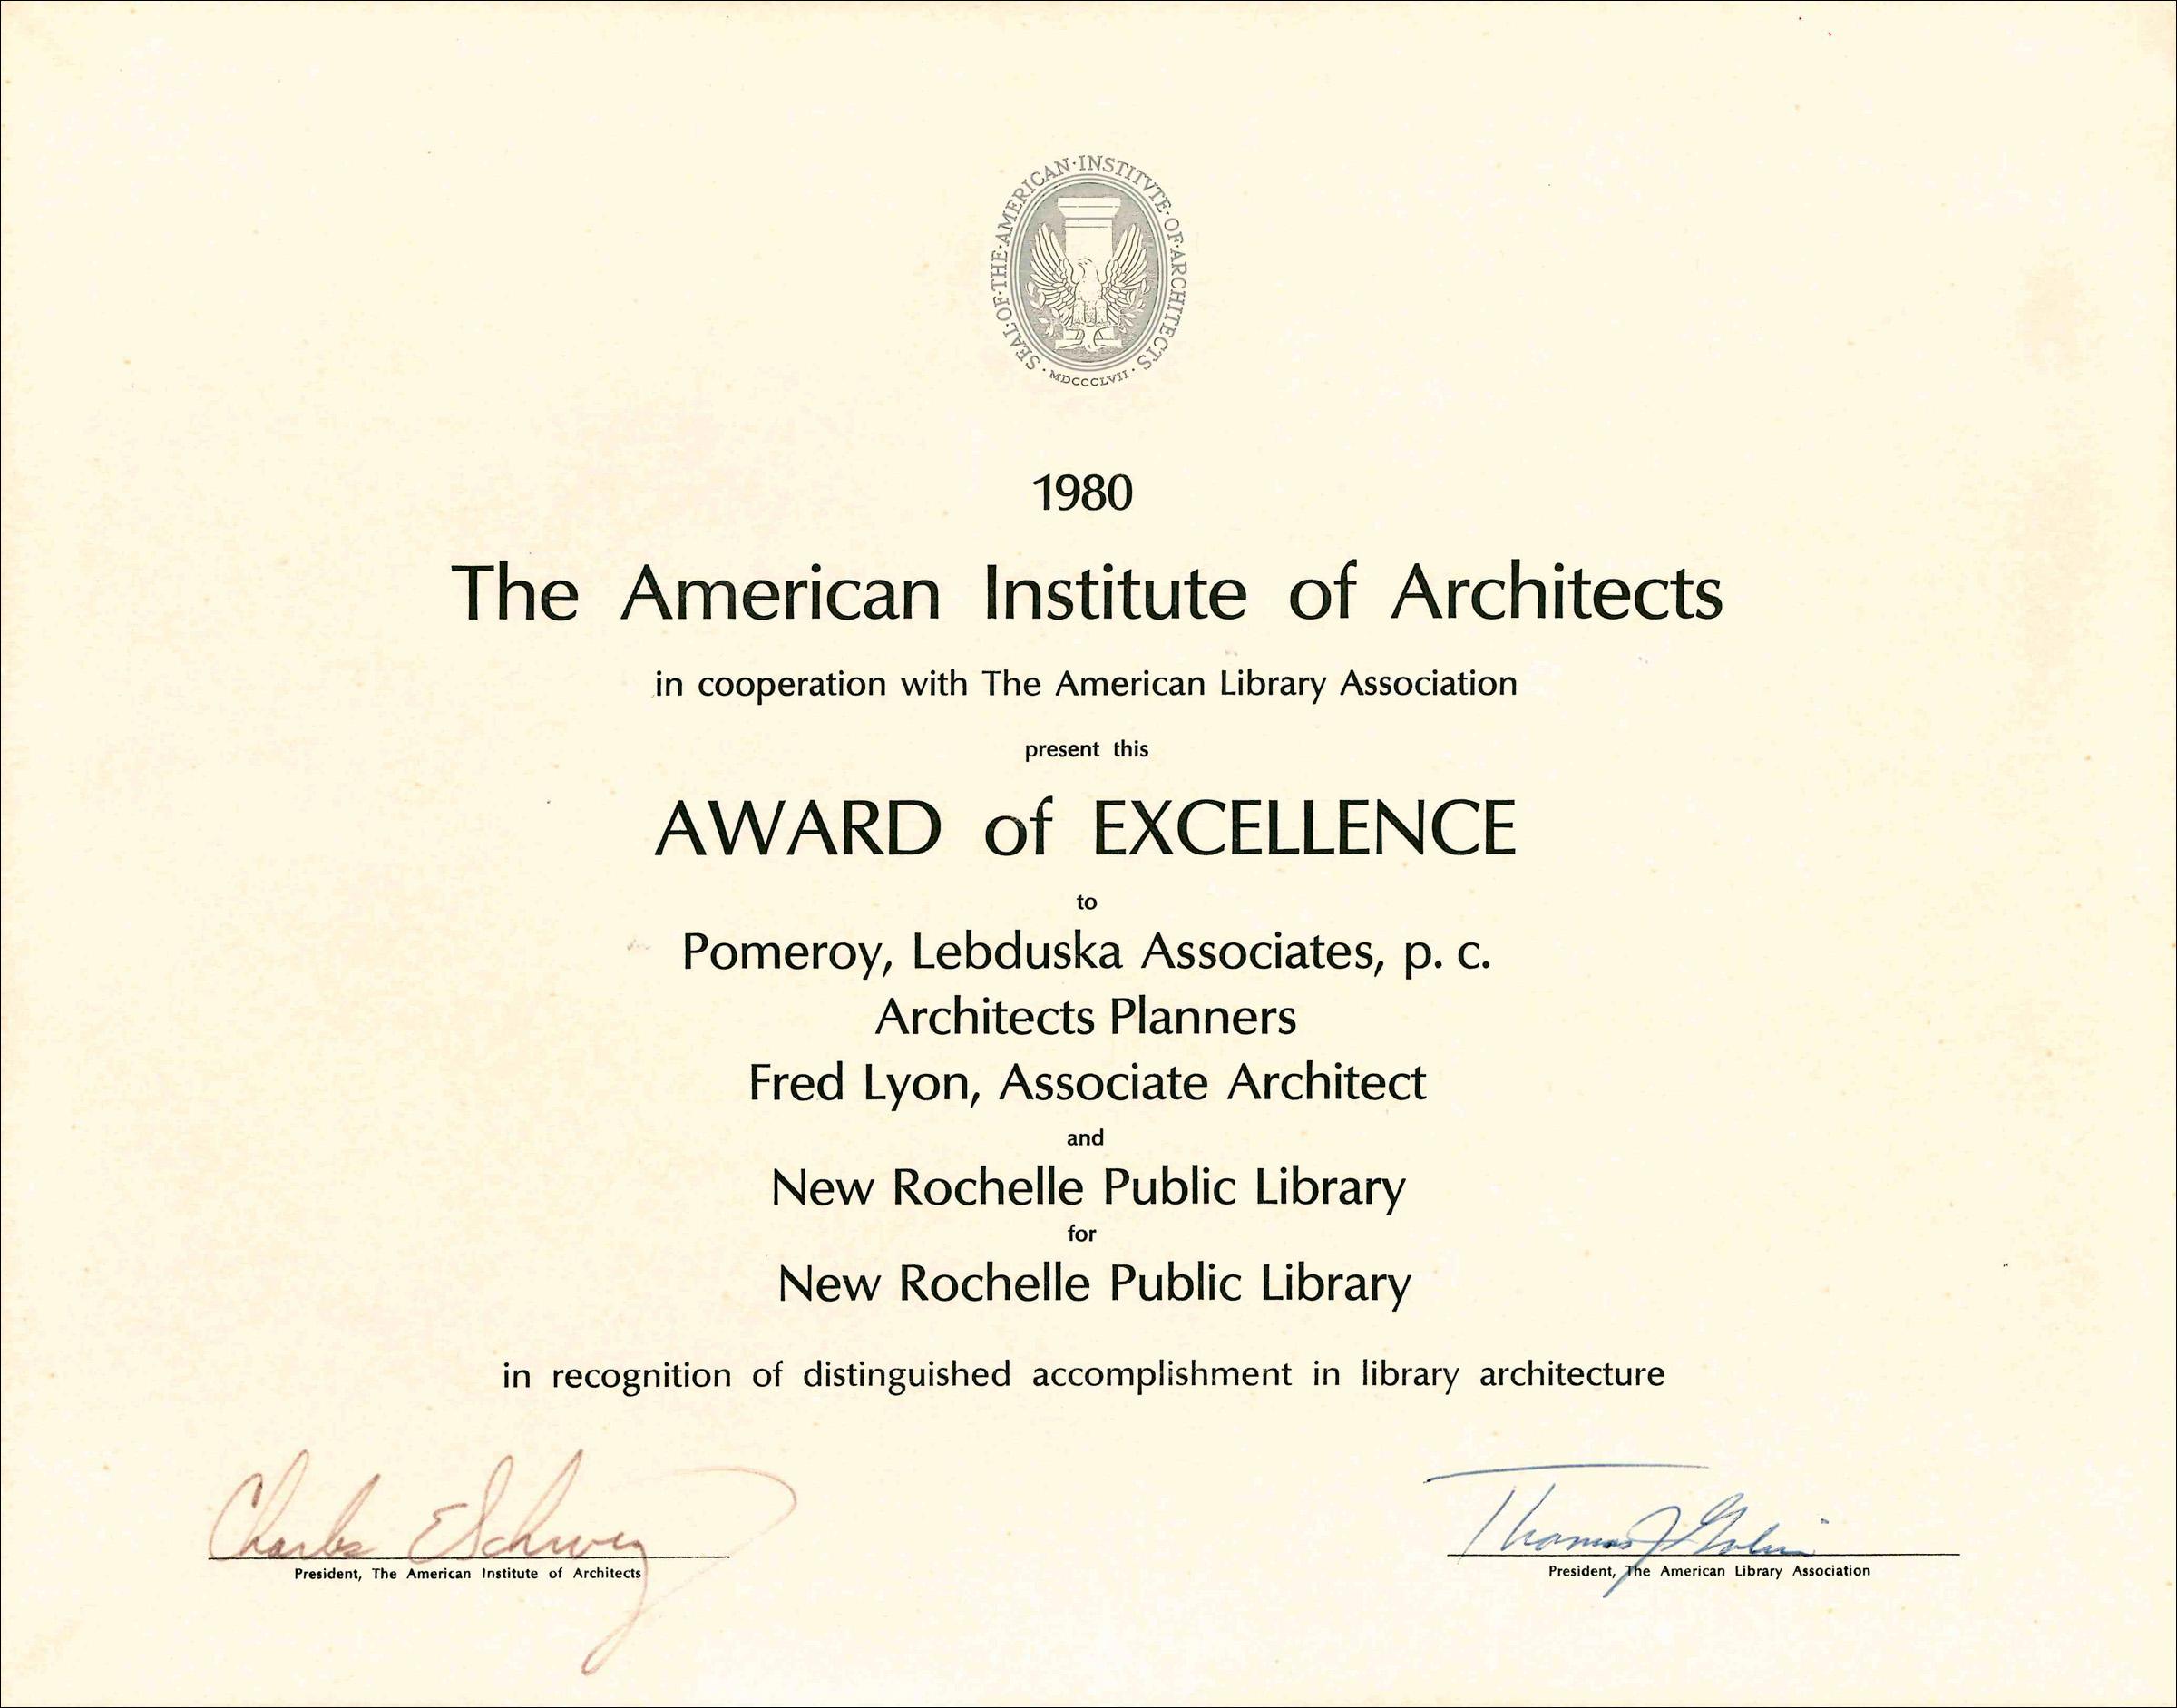 1980 AIA New Rochelle Public Library